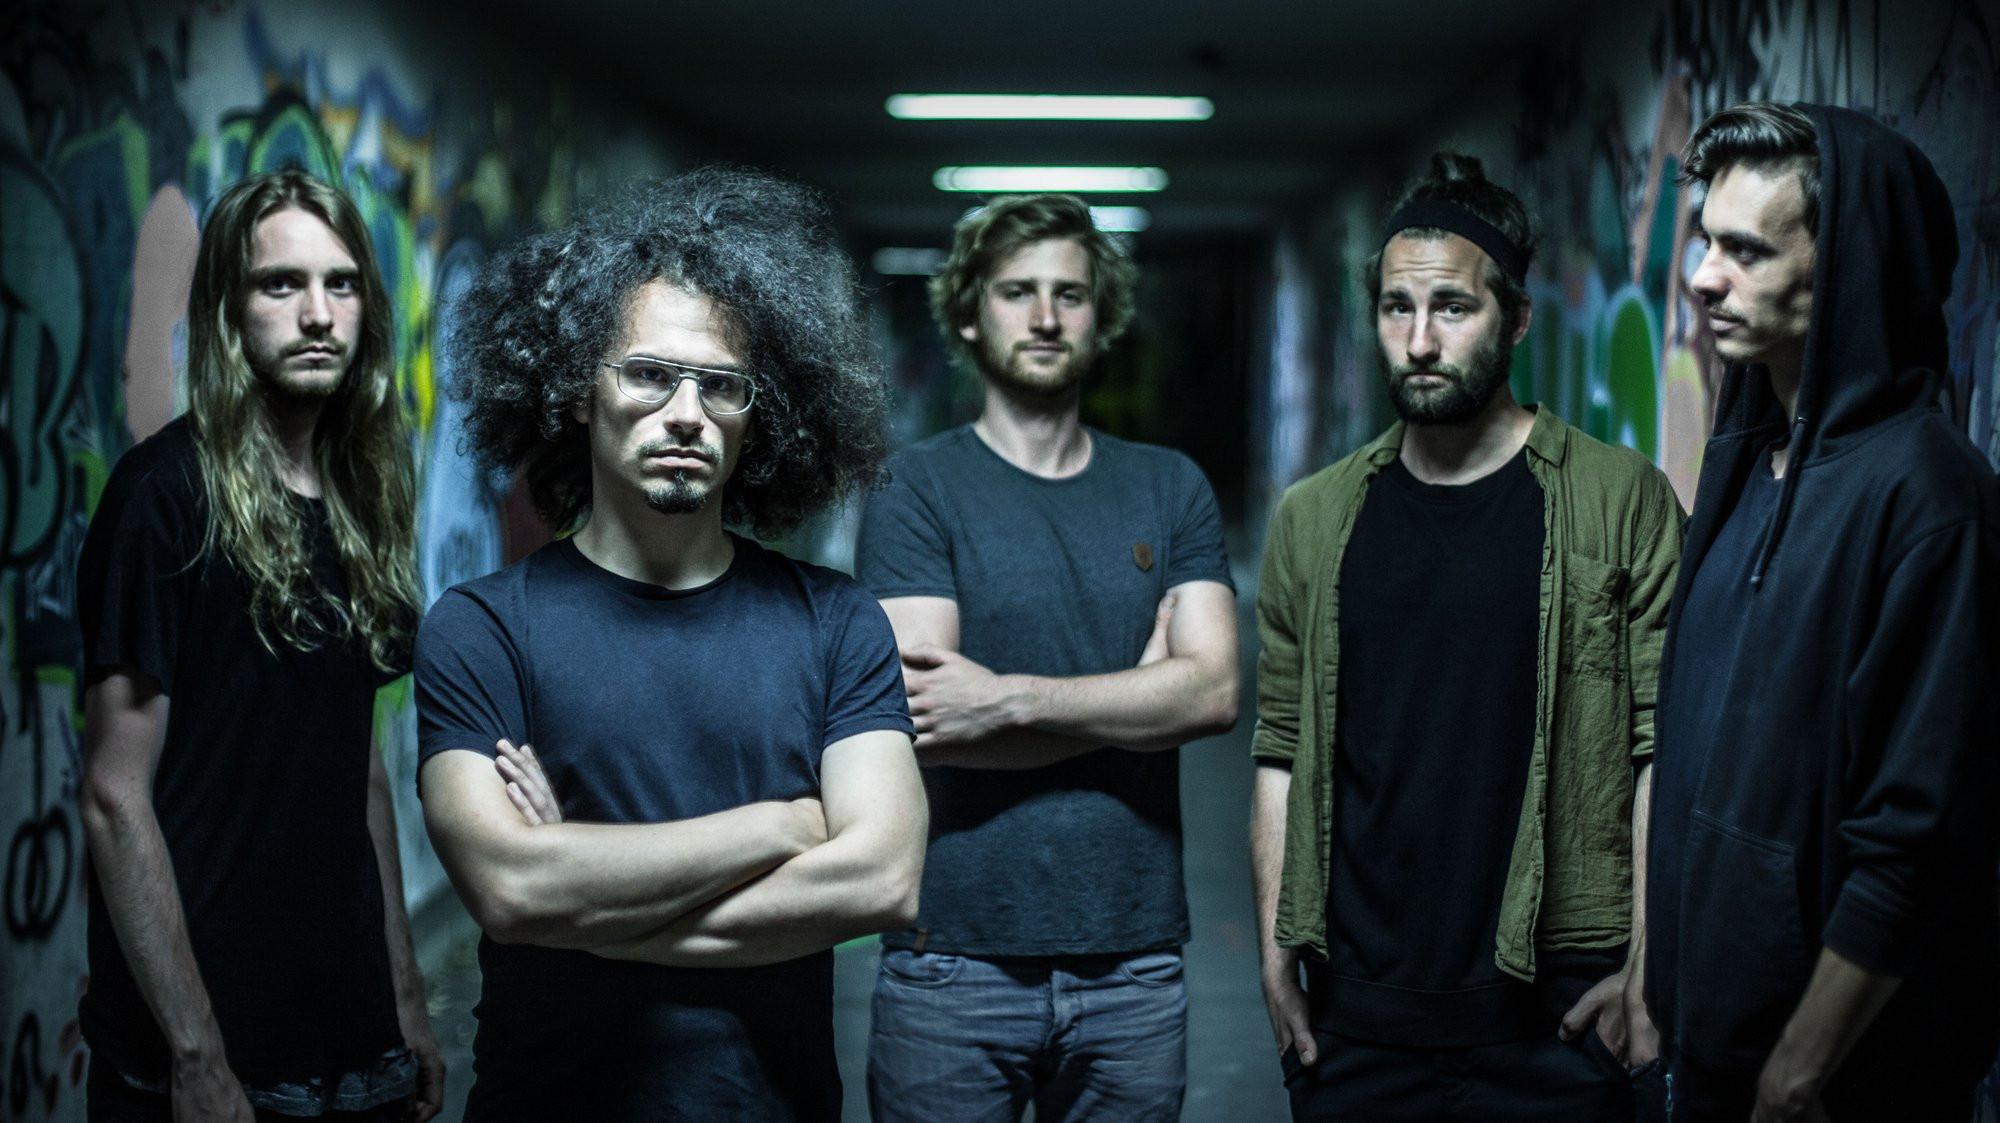 Ultima Radio - Alternative Rock aus Graz/Vienna, Austria